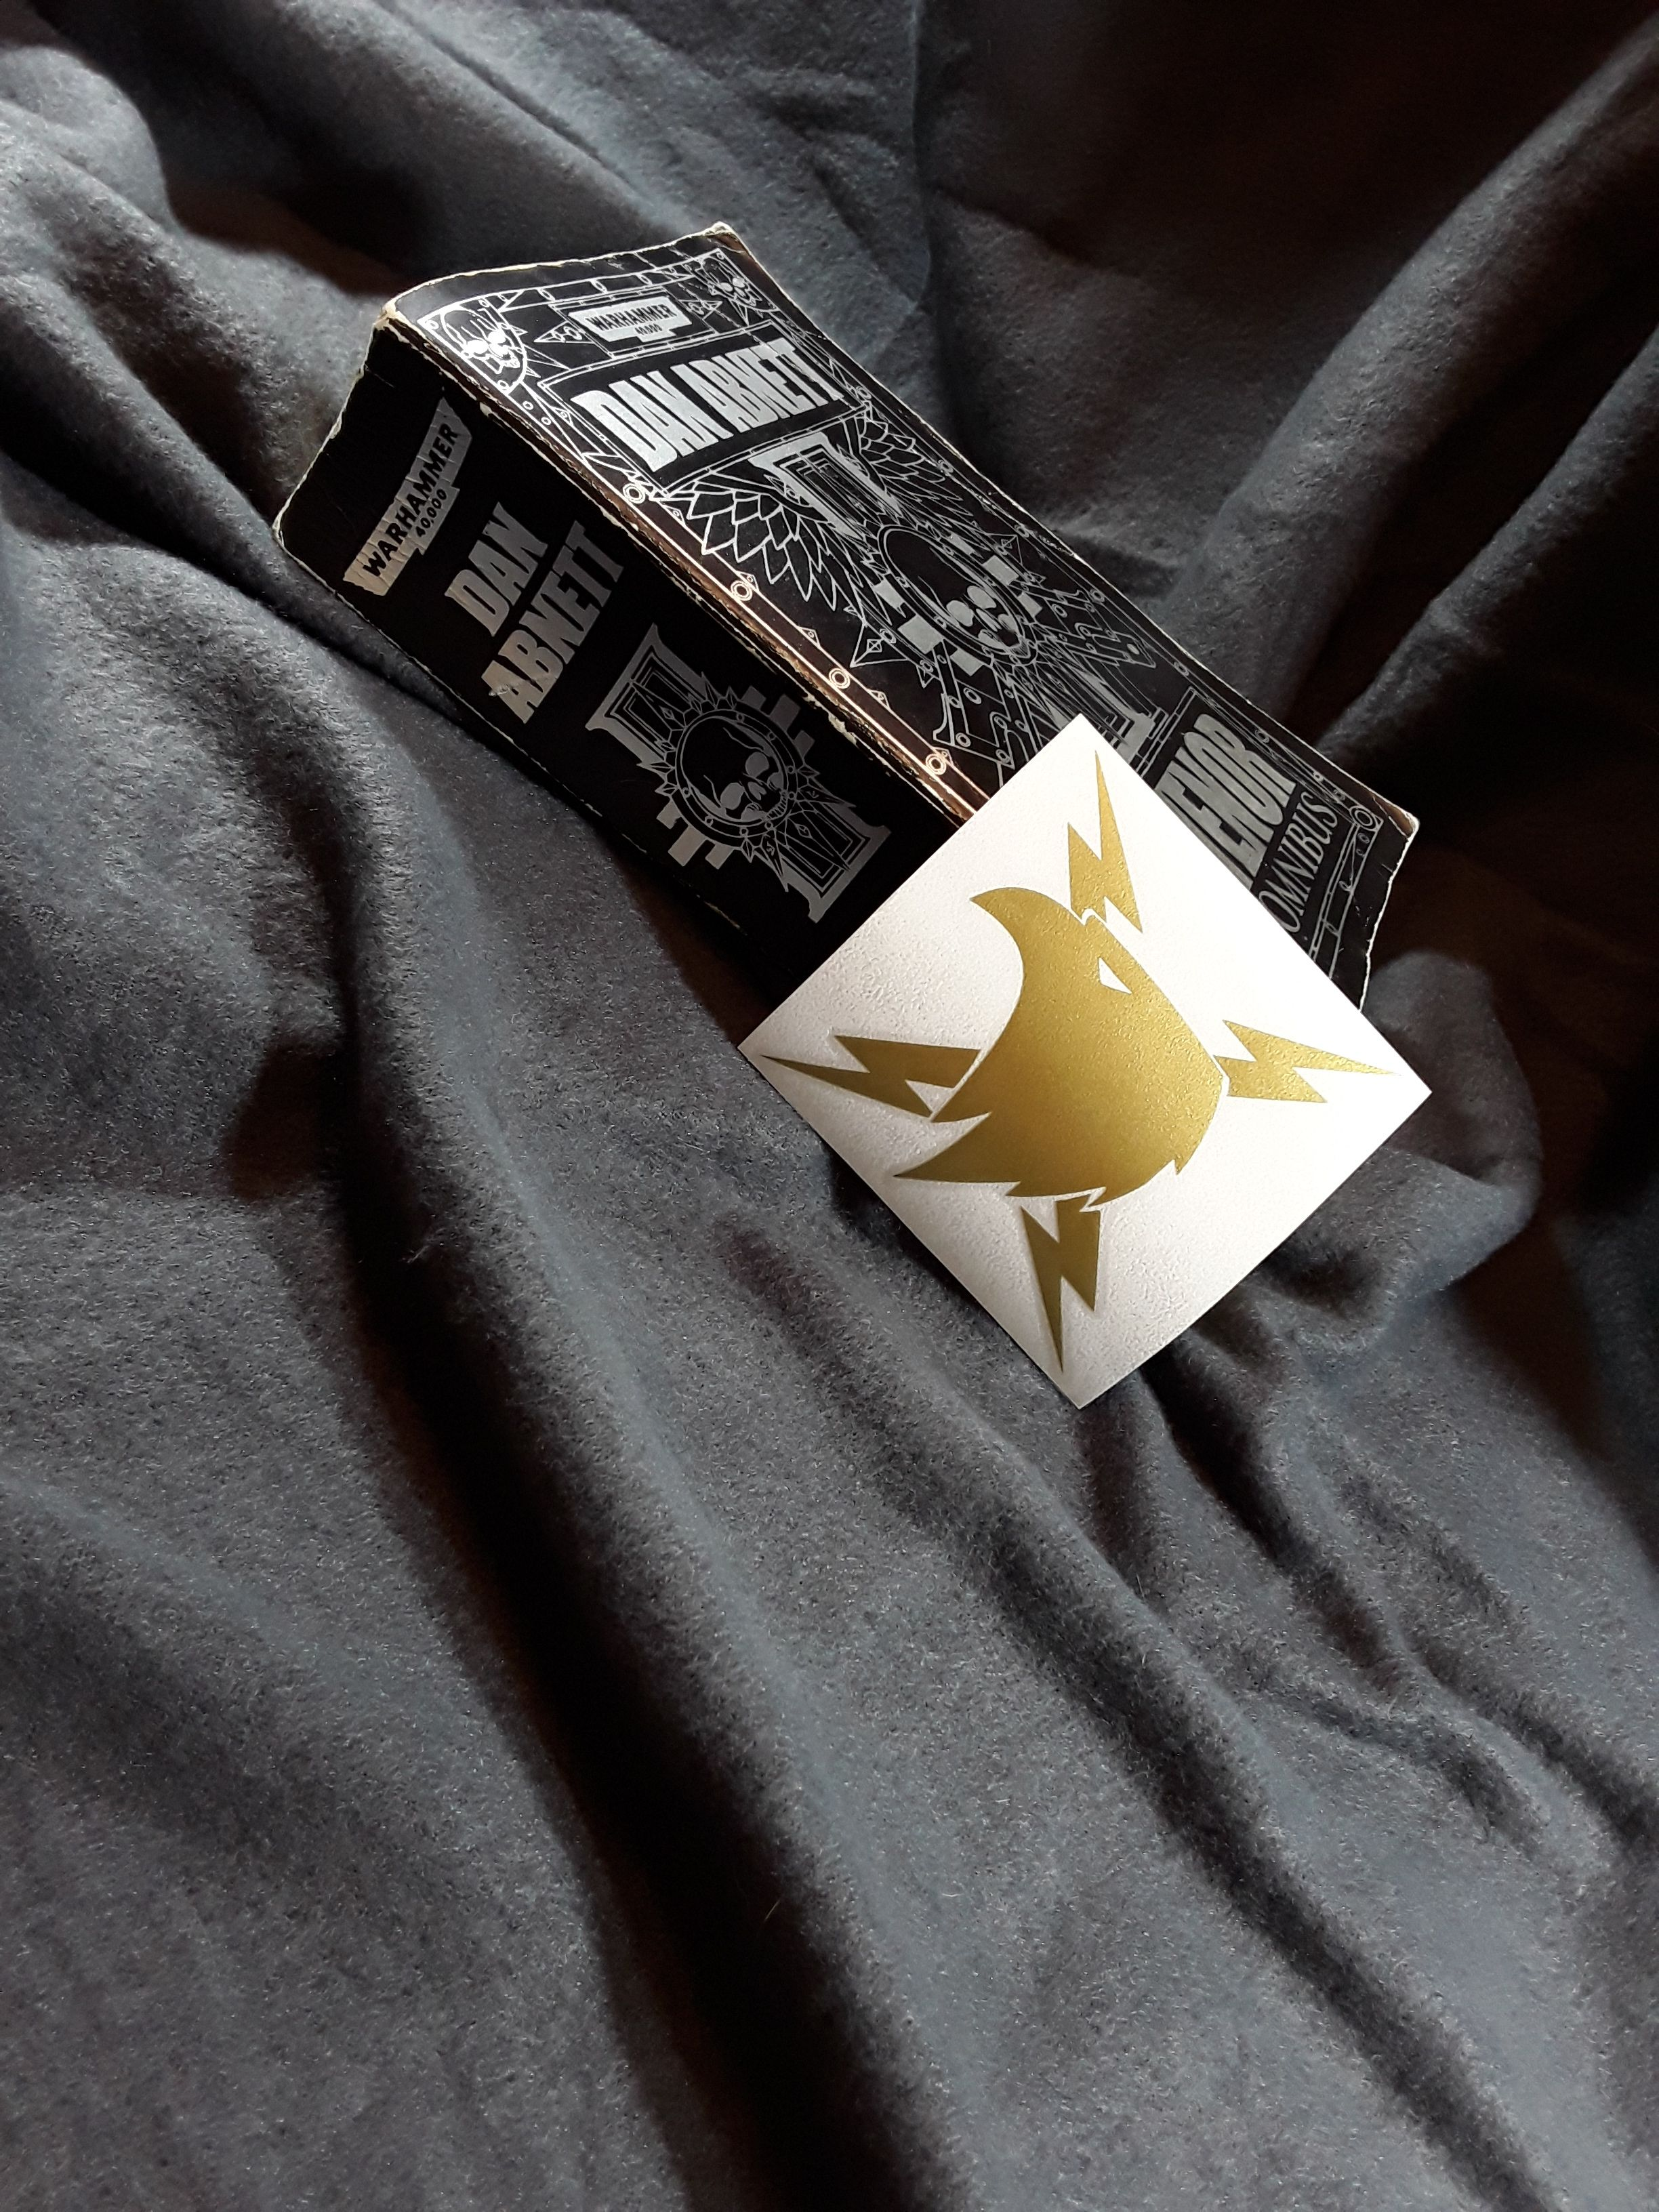 Warhammer Raptor Imperialis Inspired Vinyl Decal Etsy Vinyl Vinyl Decals Outdoor Stickers [ 3264 x 2448 Pixel ]